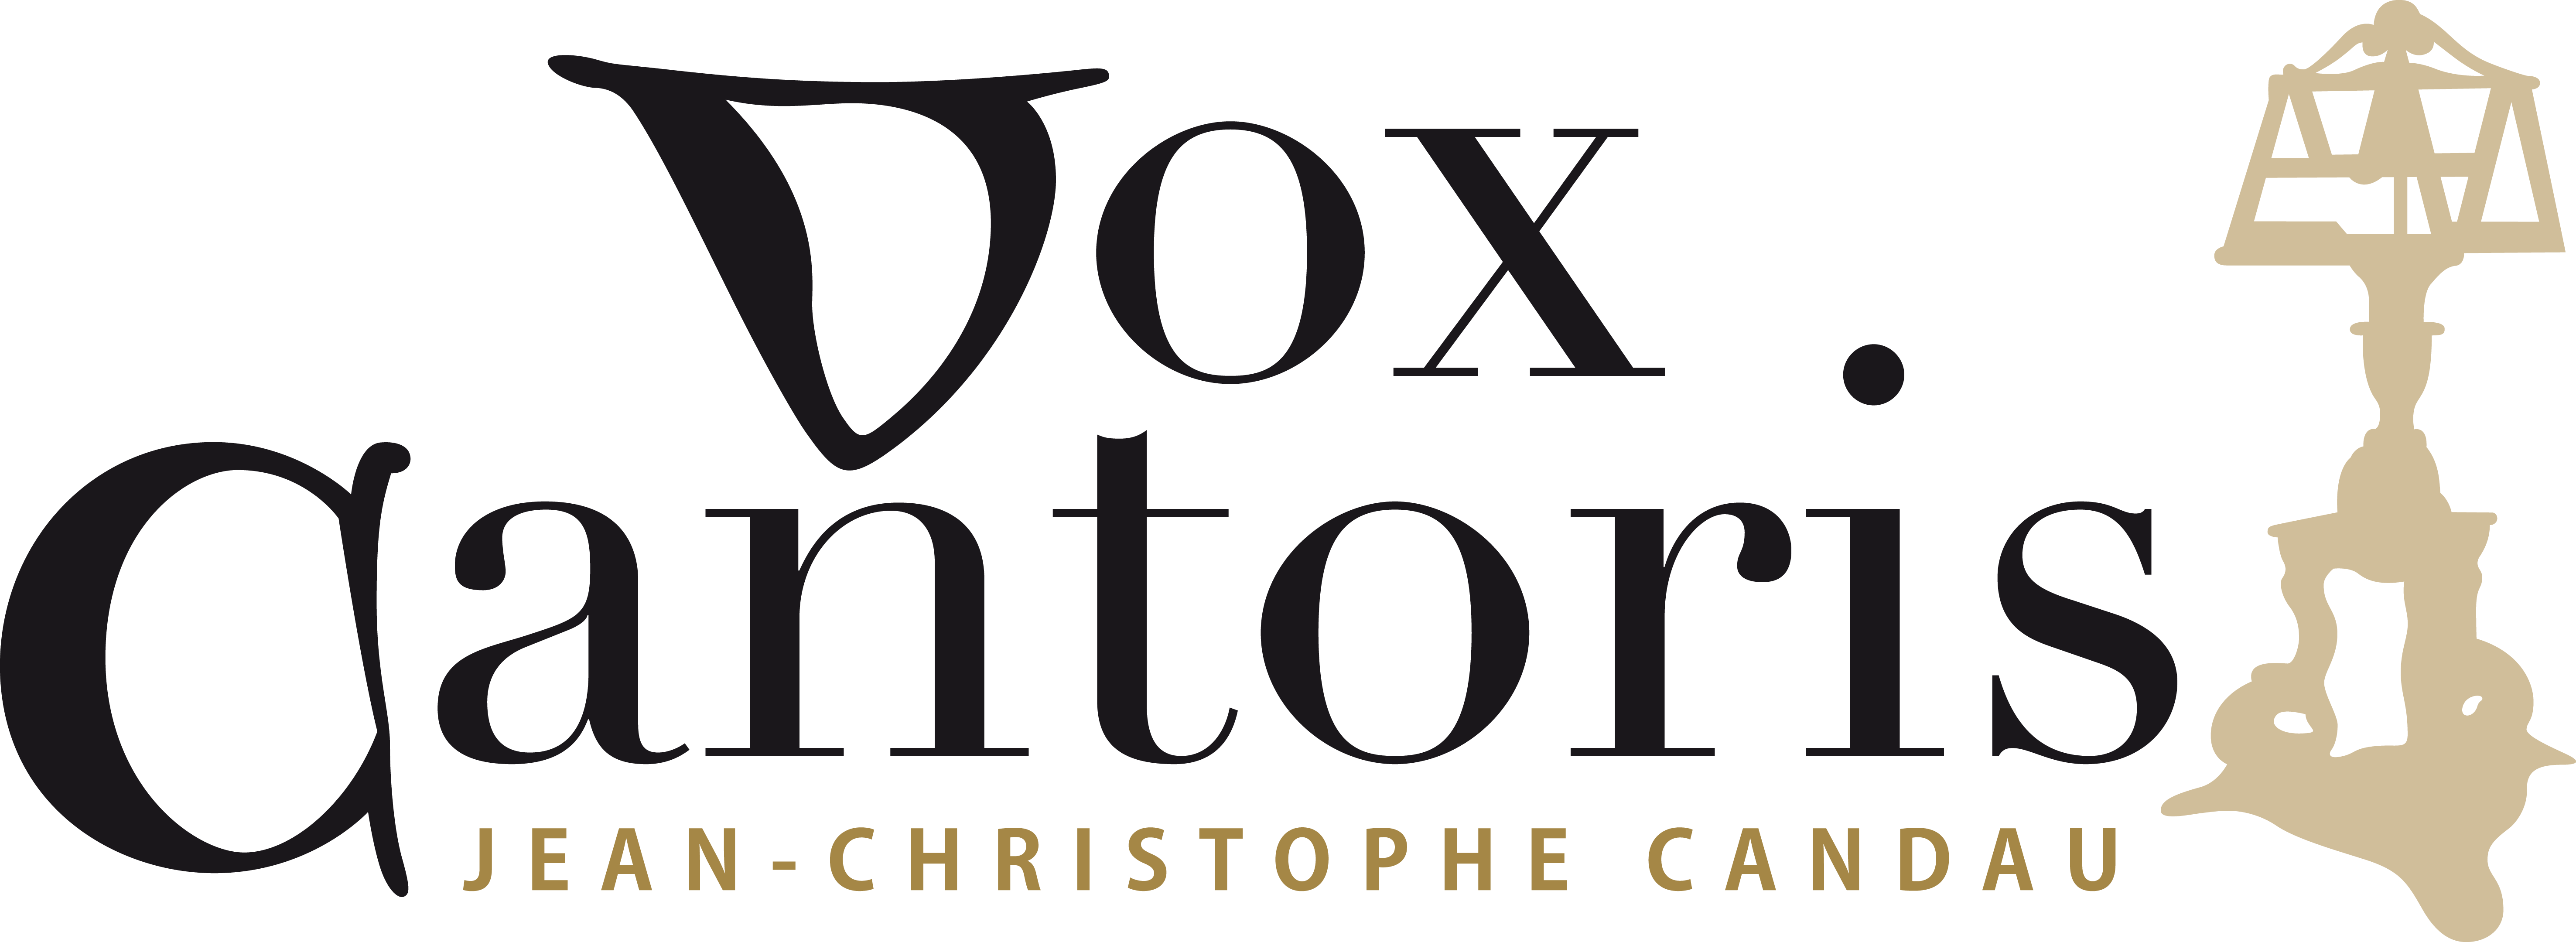 Vox Cantoris